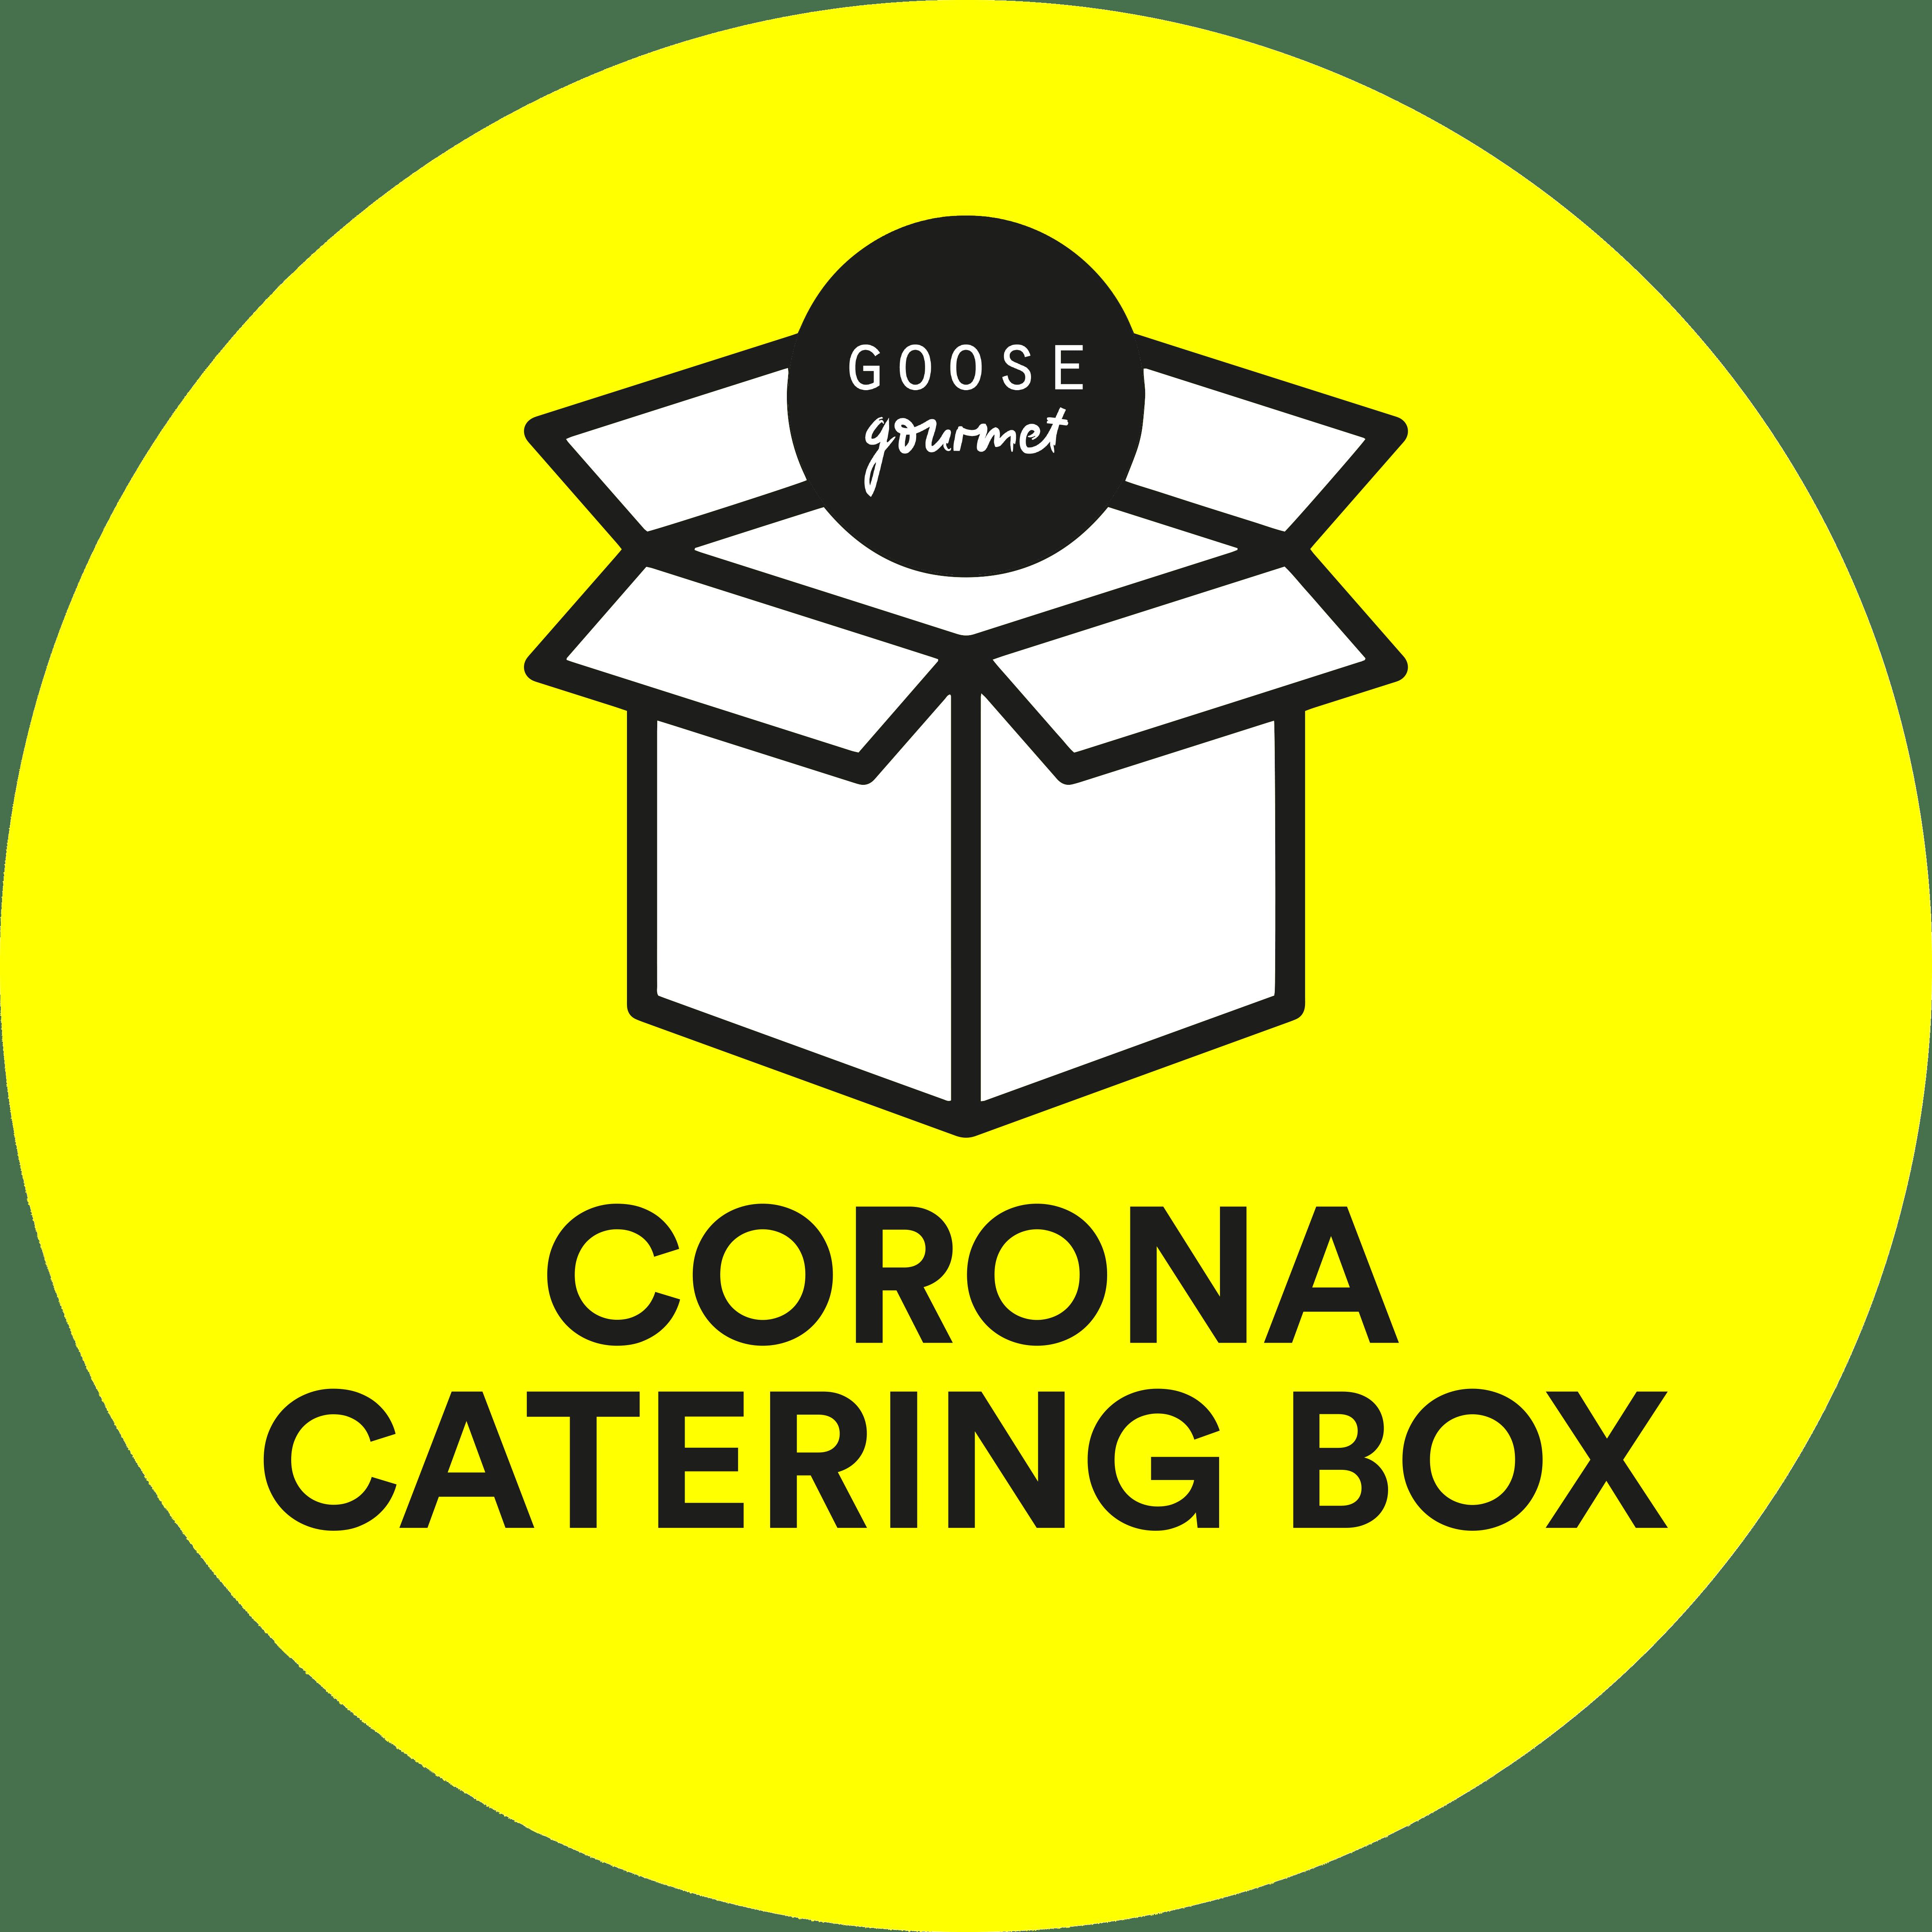 GOOSE Gourmet Dinner Box Drive-In